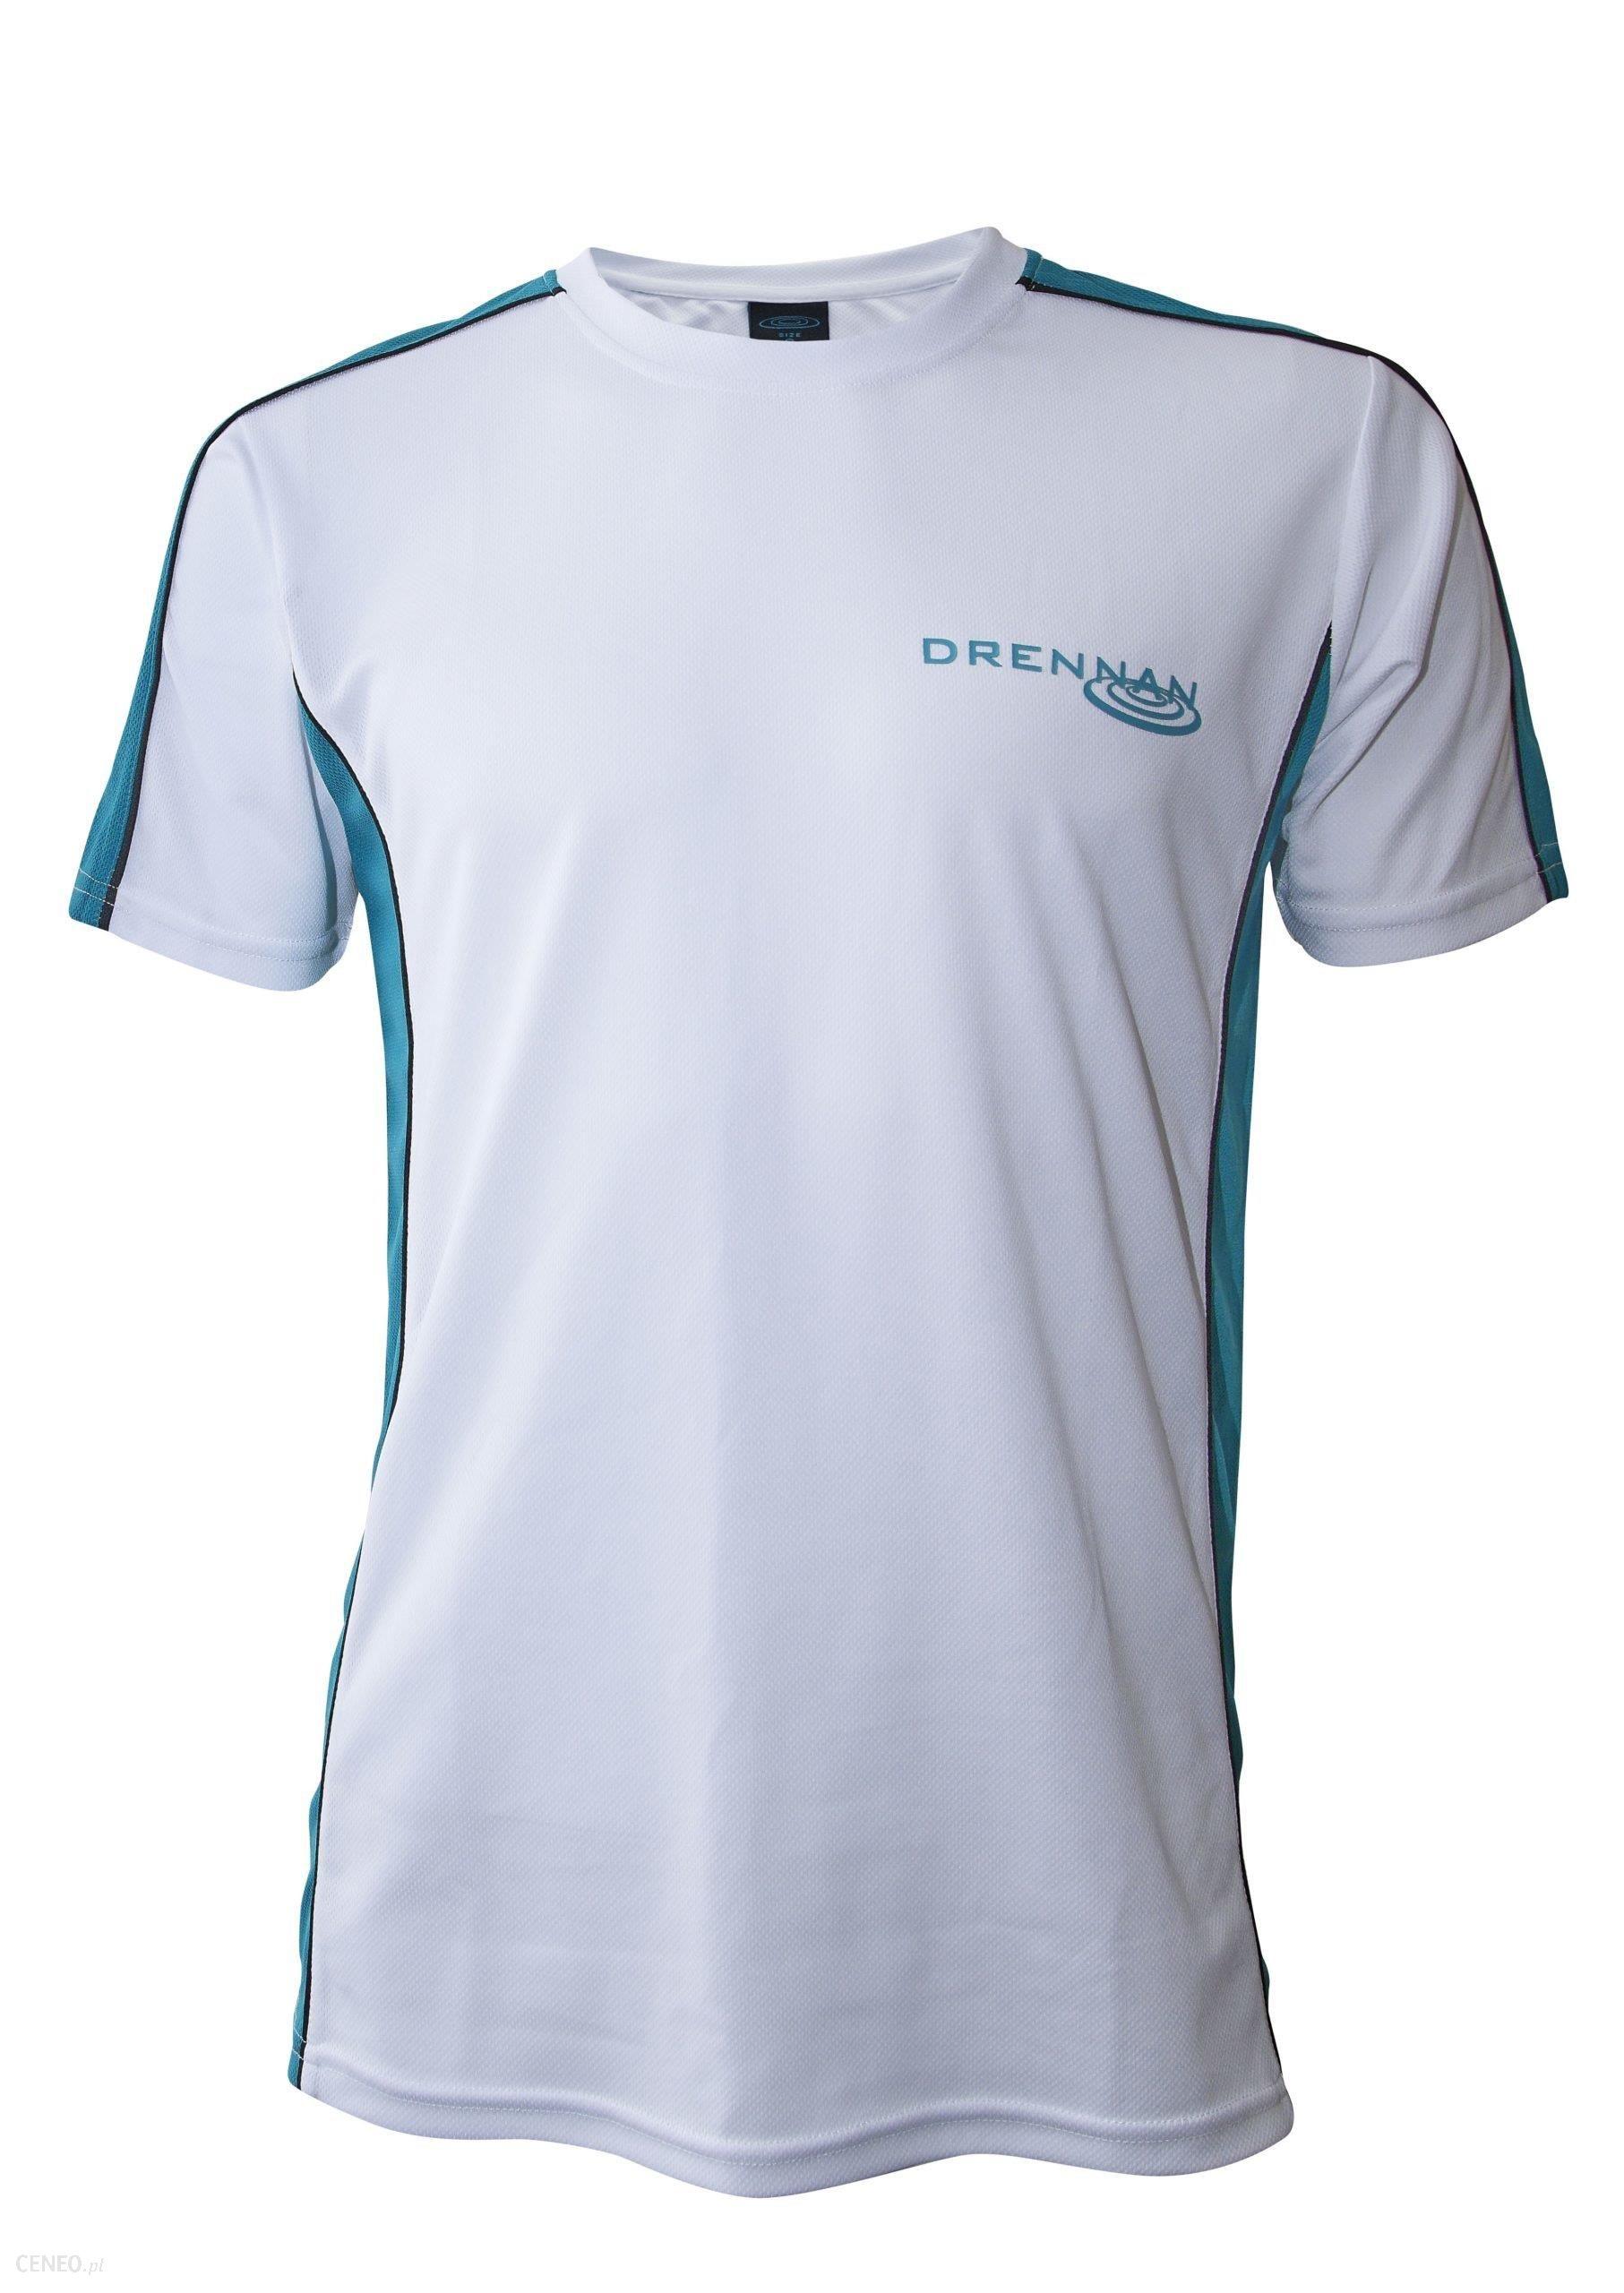 Drennan Koszulka T-Shirt Performance White